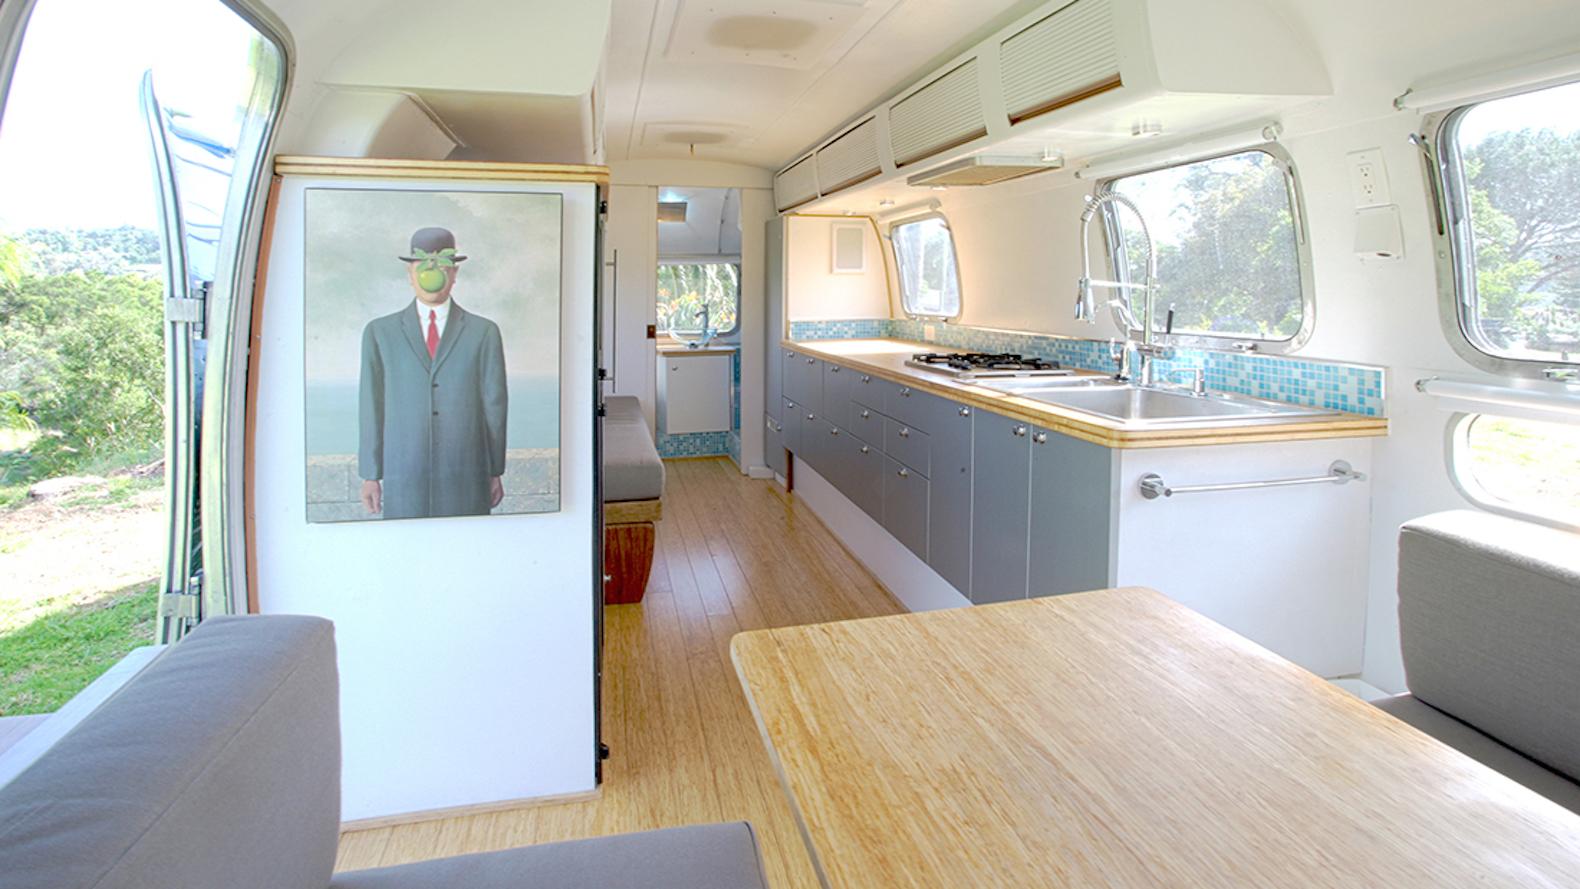 7 retro-chic Airstream renovations